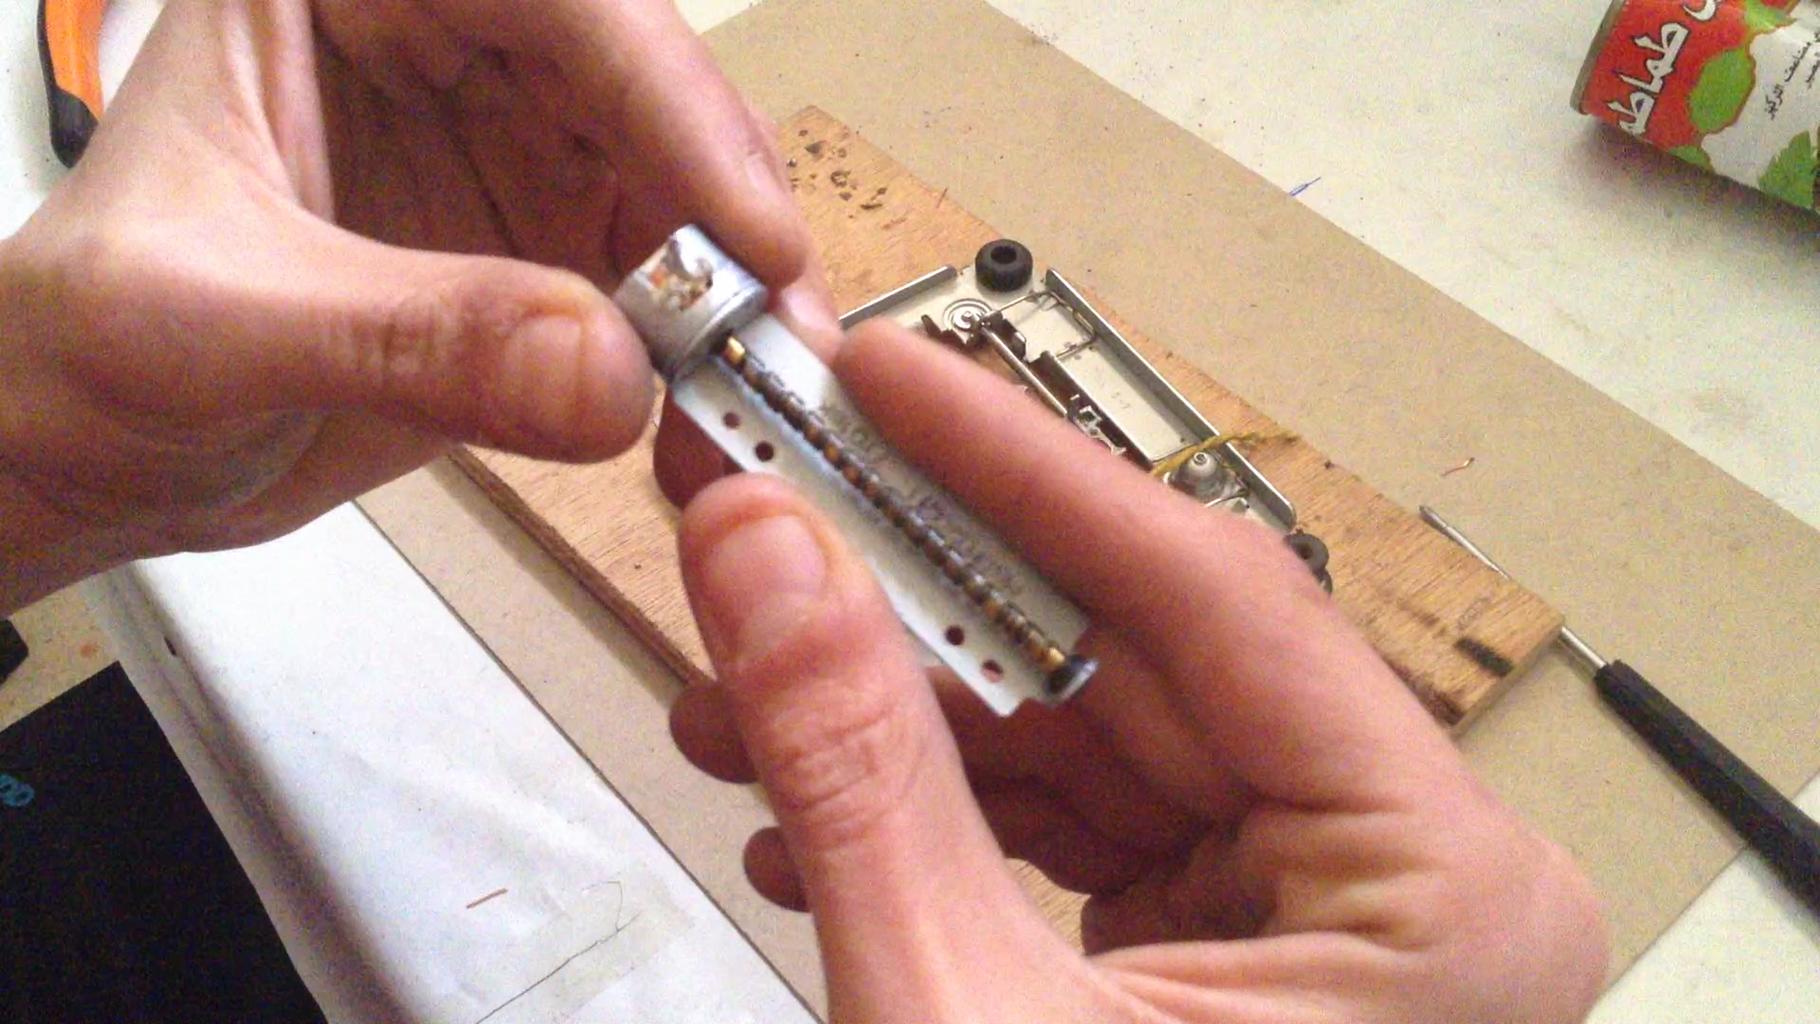 Wiring the Stepper Motors